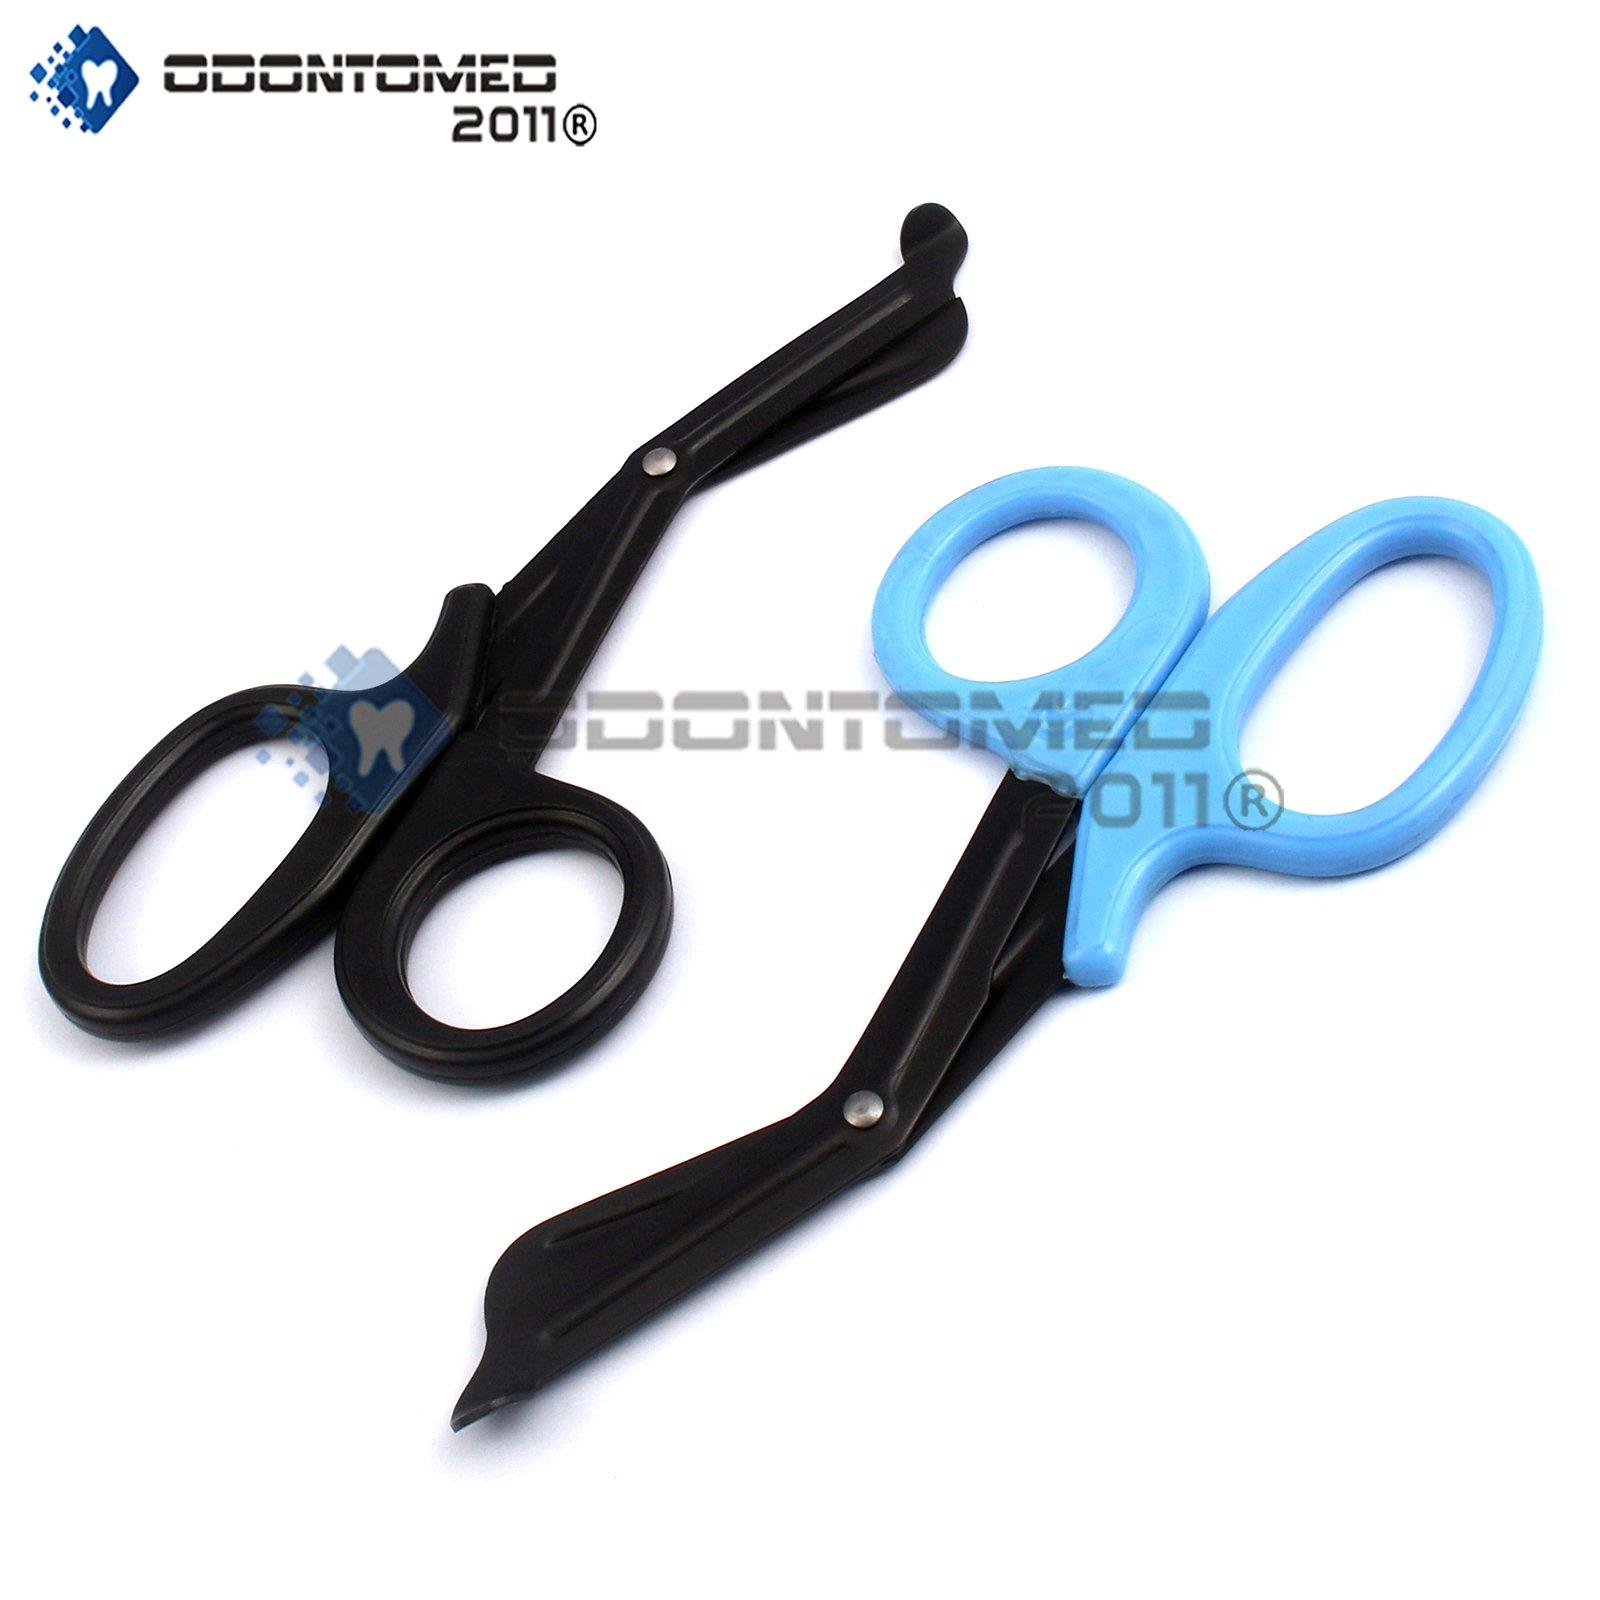 OdontoMed2011® EMT Trauma Shears - Stainless Steel Bandage Scissors for Nursing Purposes - Sharp 2-pack Scissor is Perfect for EMS, Doctors, Nurses, Cutting Bandages 5.5'' ( Black + Teal ) 5 1/2'' Emt